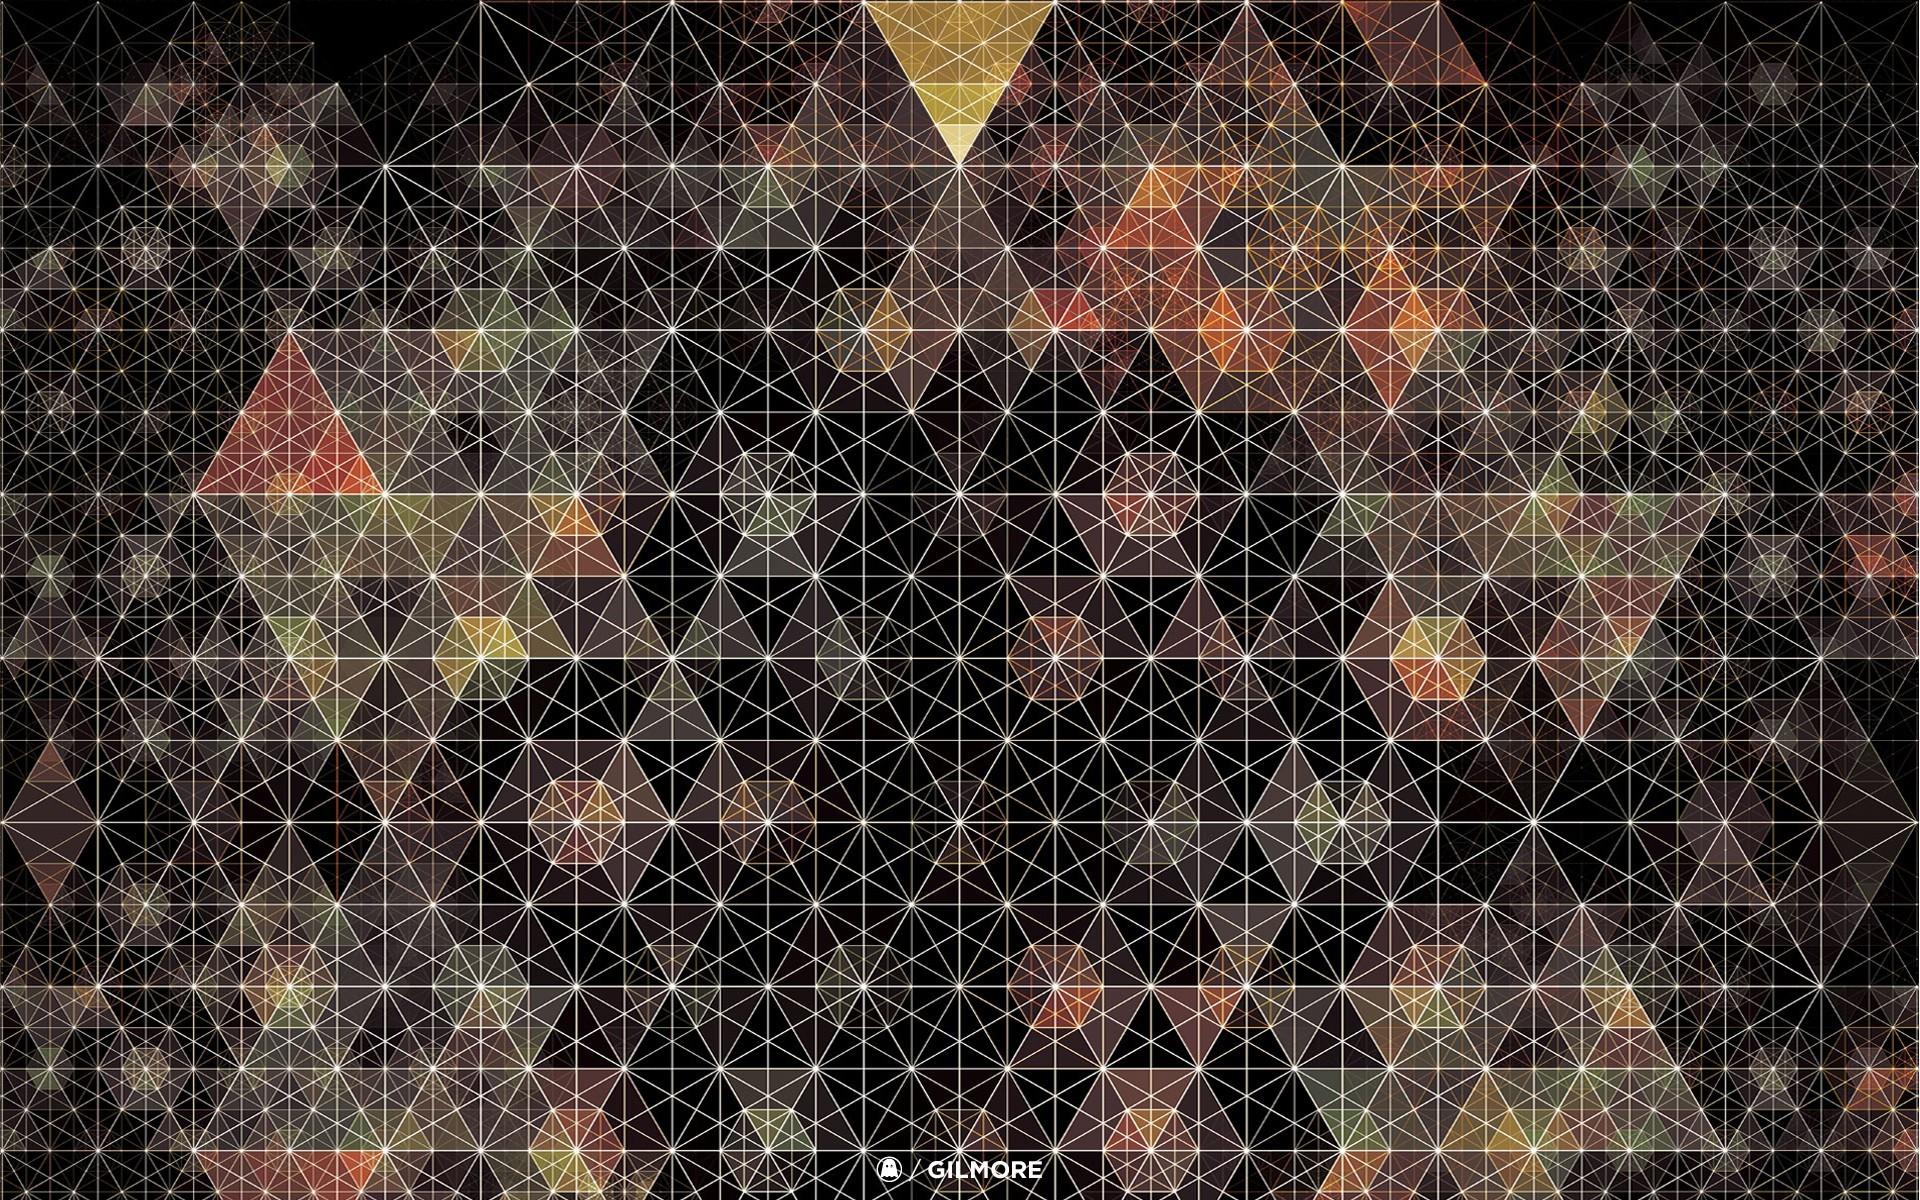 Wonderful Wallpaper Macbook Geometric - 1019059-new-geometry-dash-wallpapers-1920x1200-for-iphone-5s  Gallery_25771.jpg